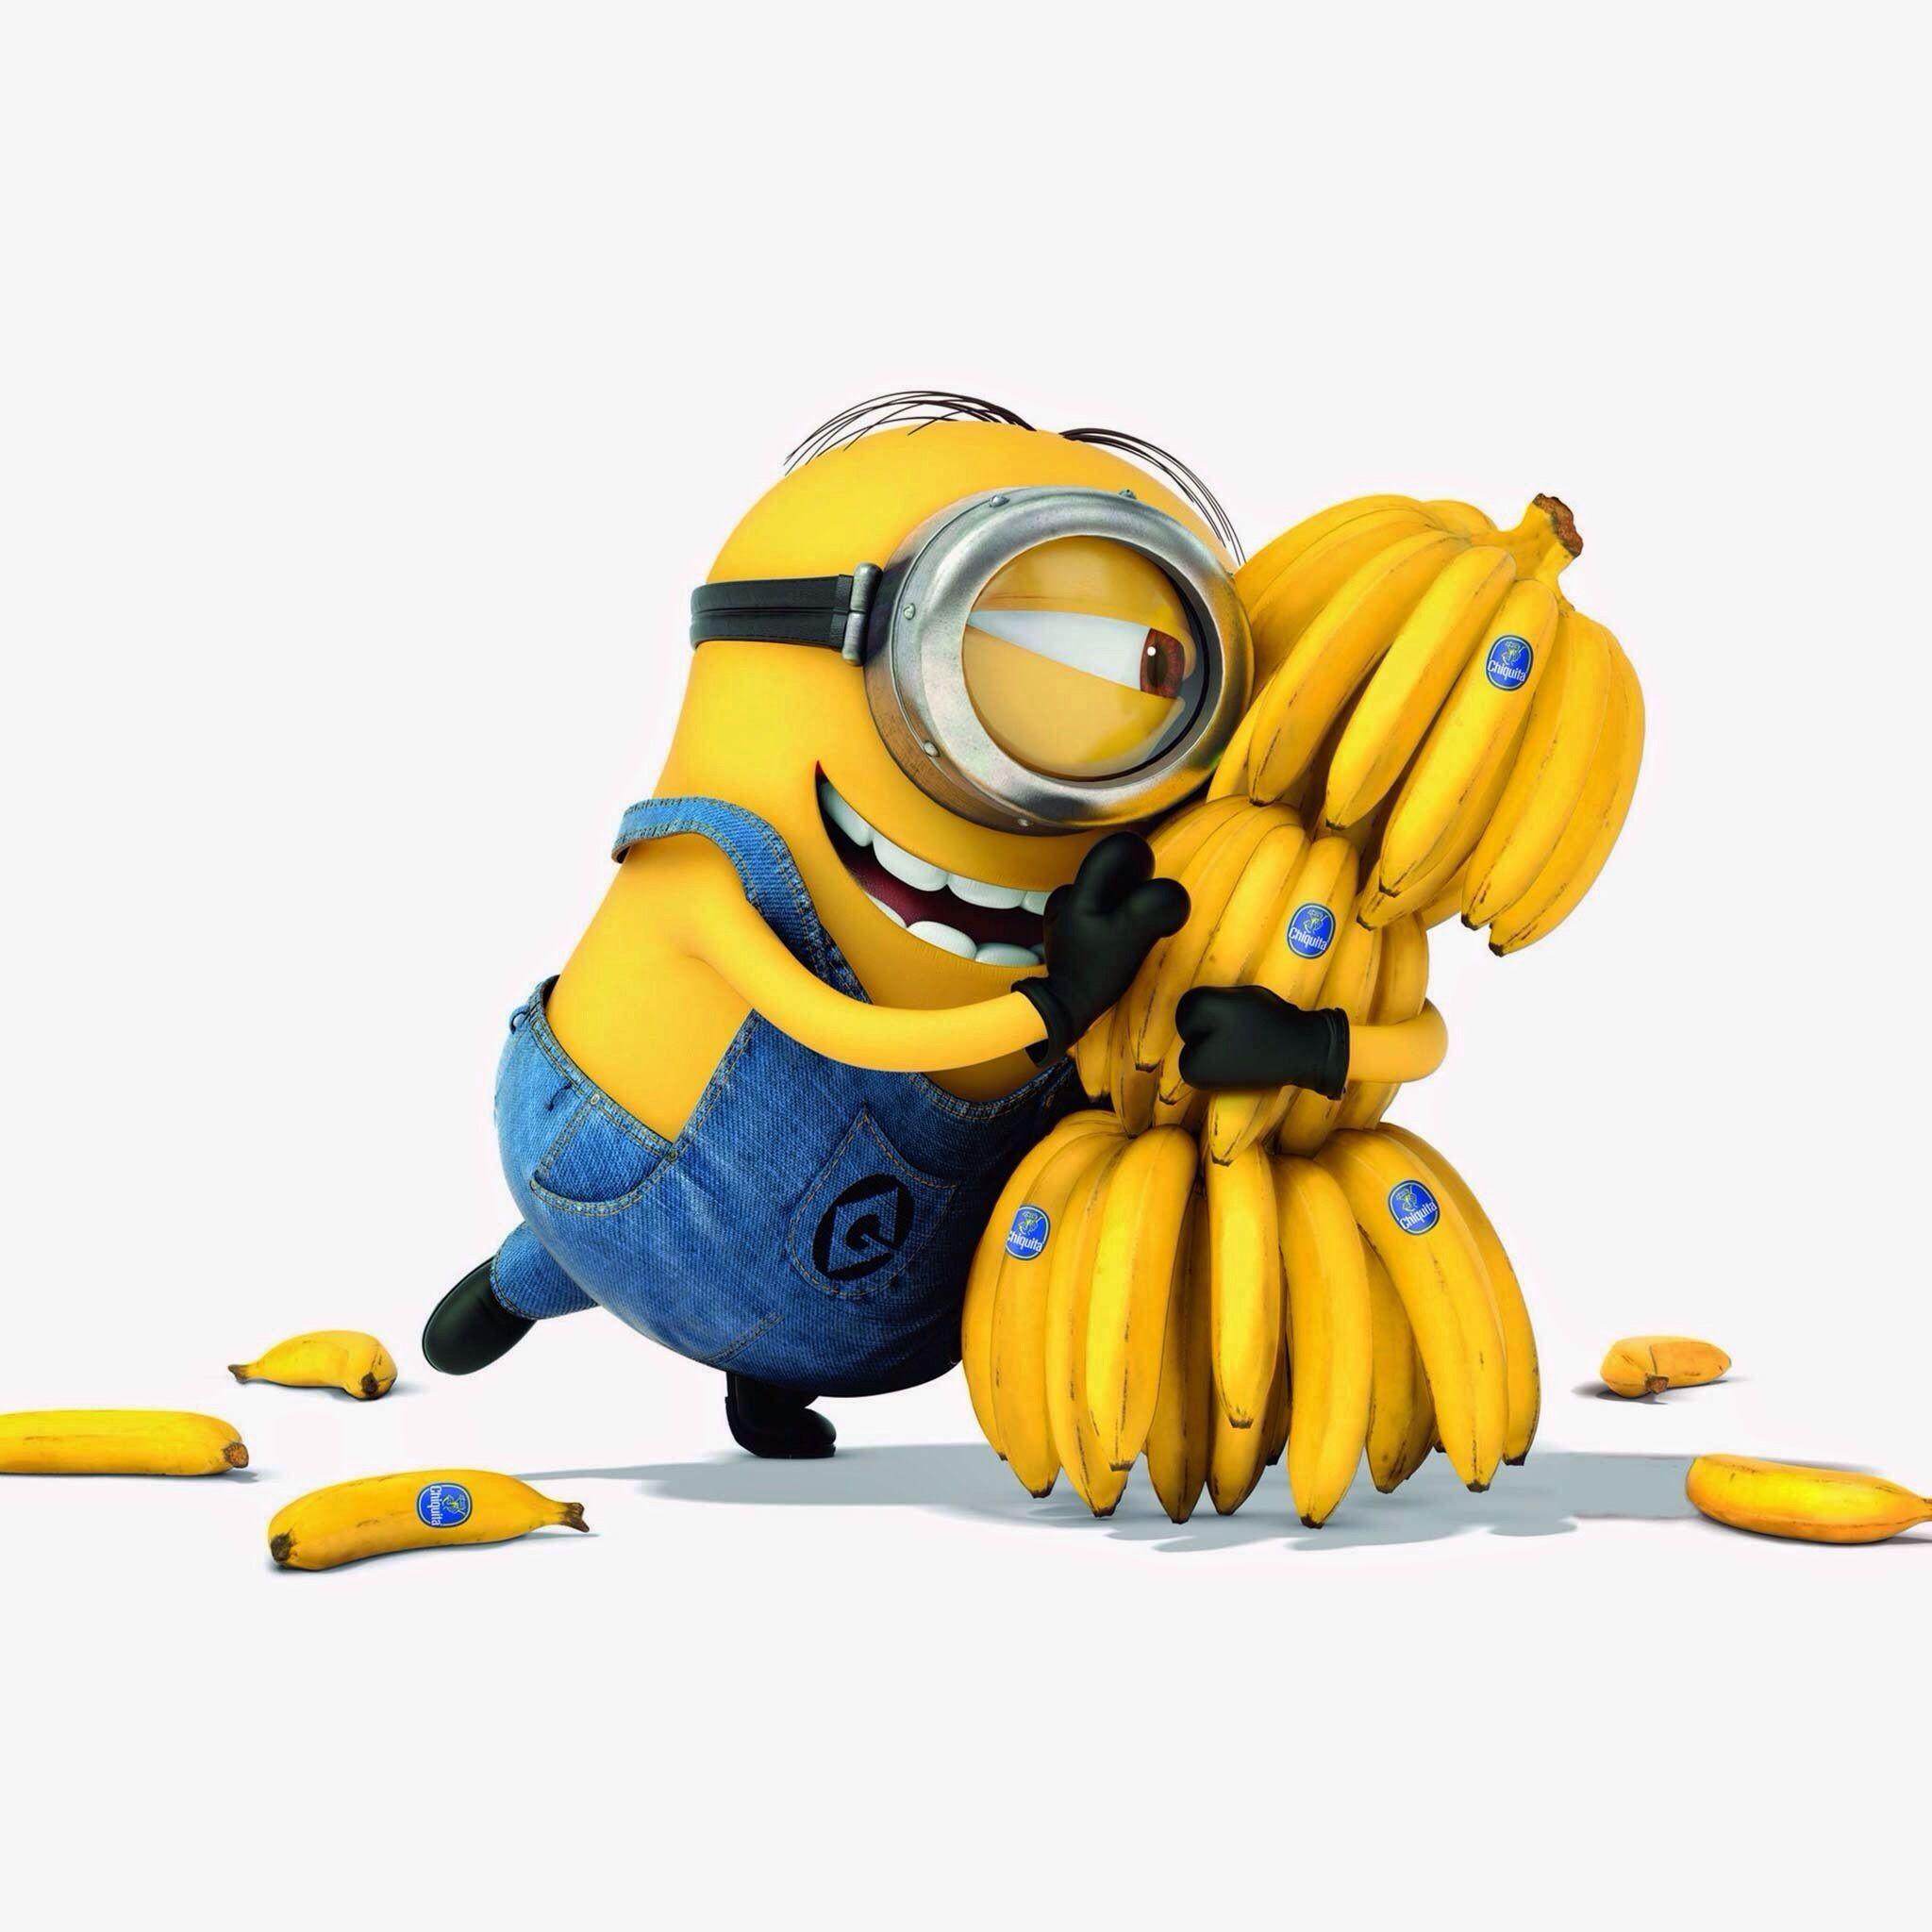 Inspirational Minion Banana Wallpaper Papel De Parede Minions Humor Minion Minions